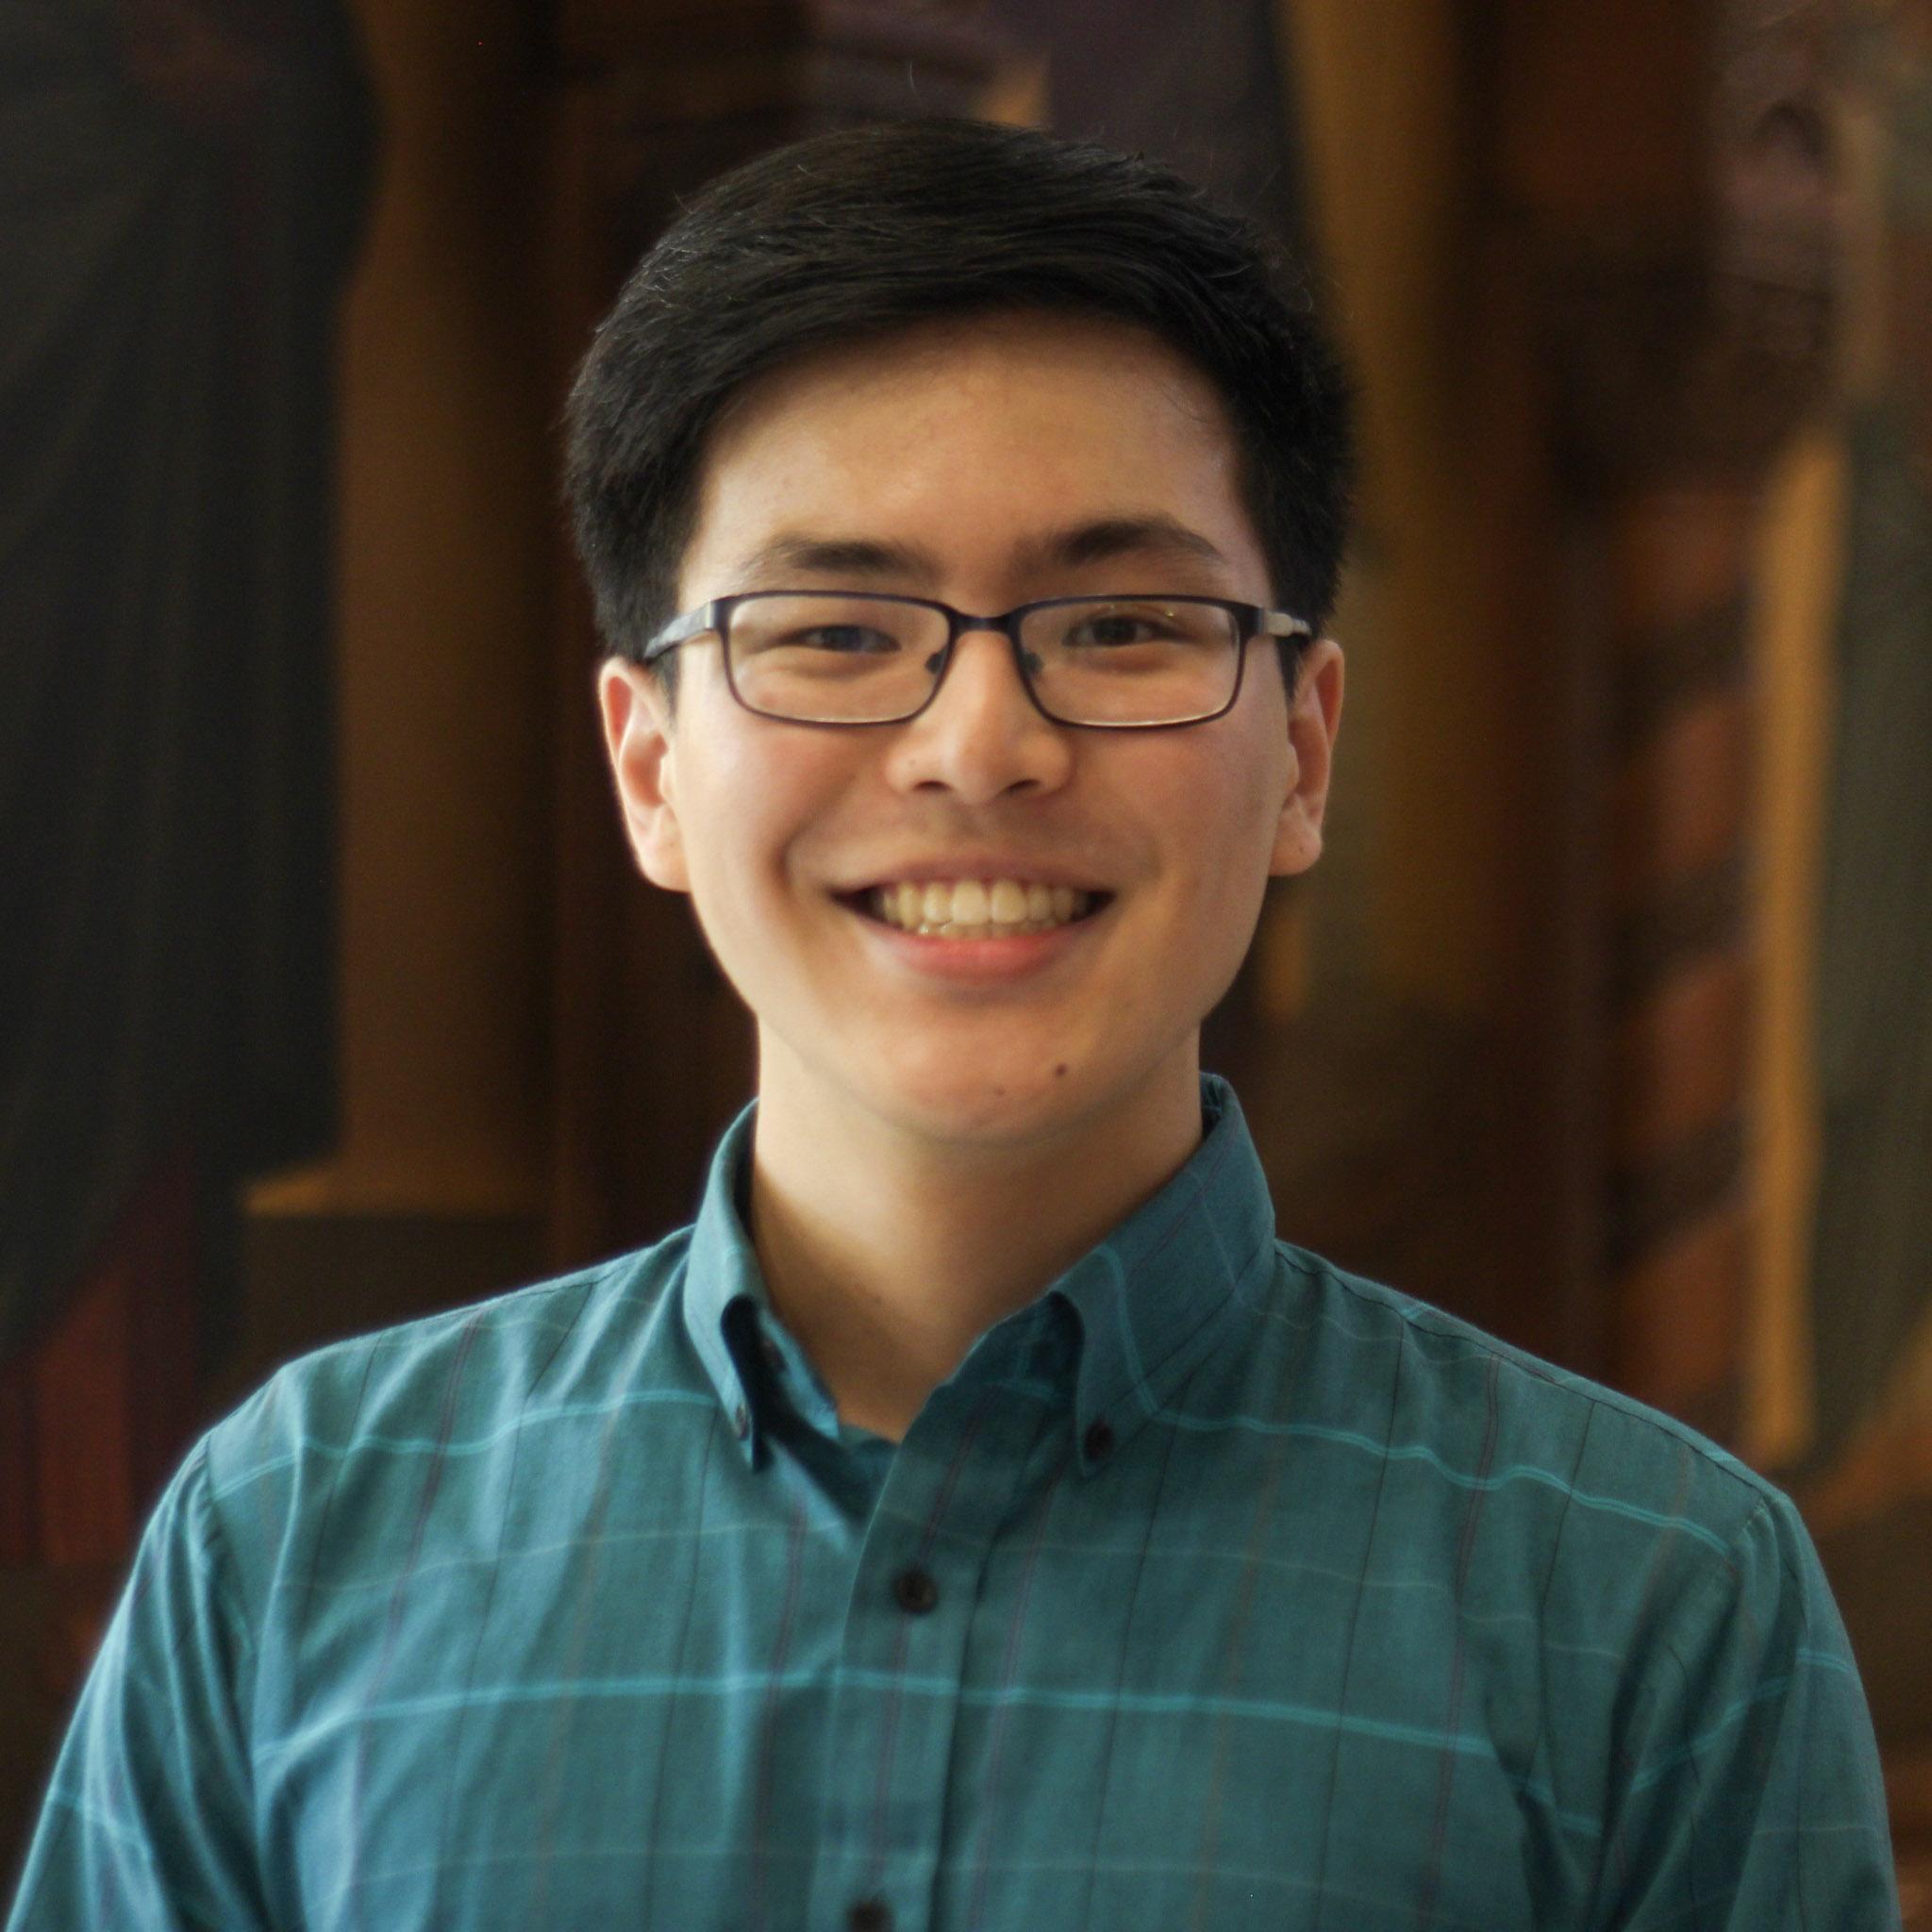 Nathaniel Liu